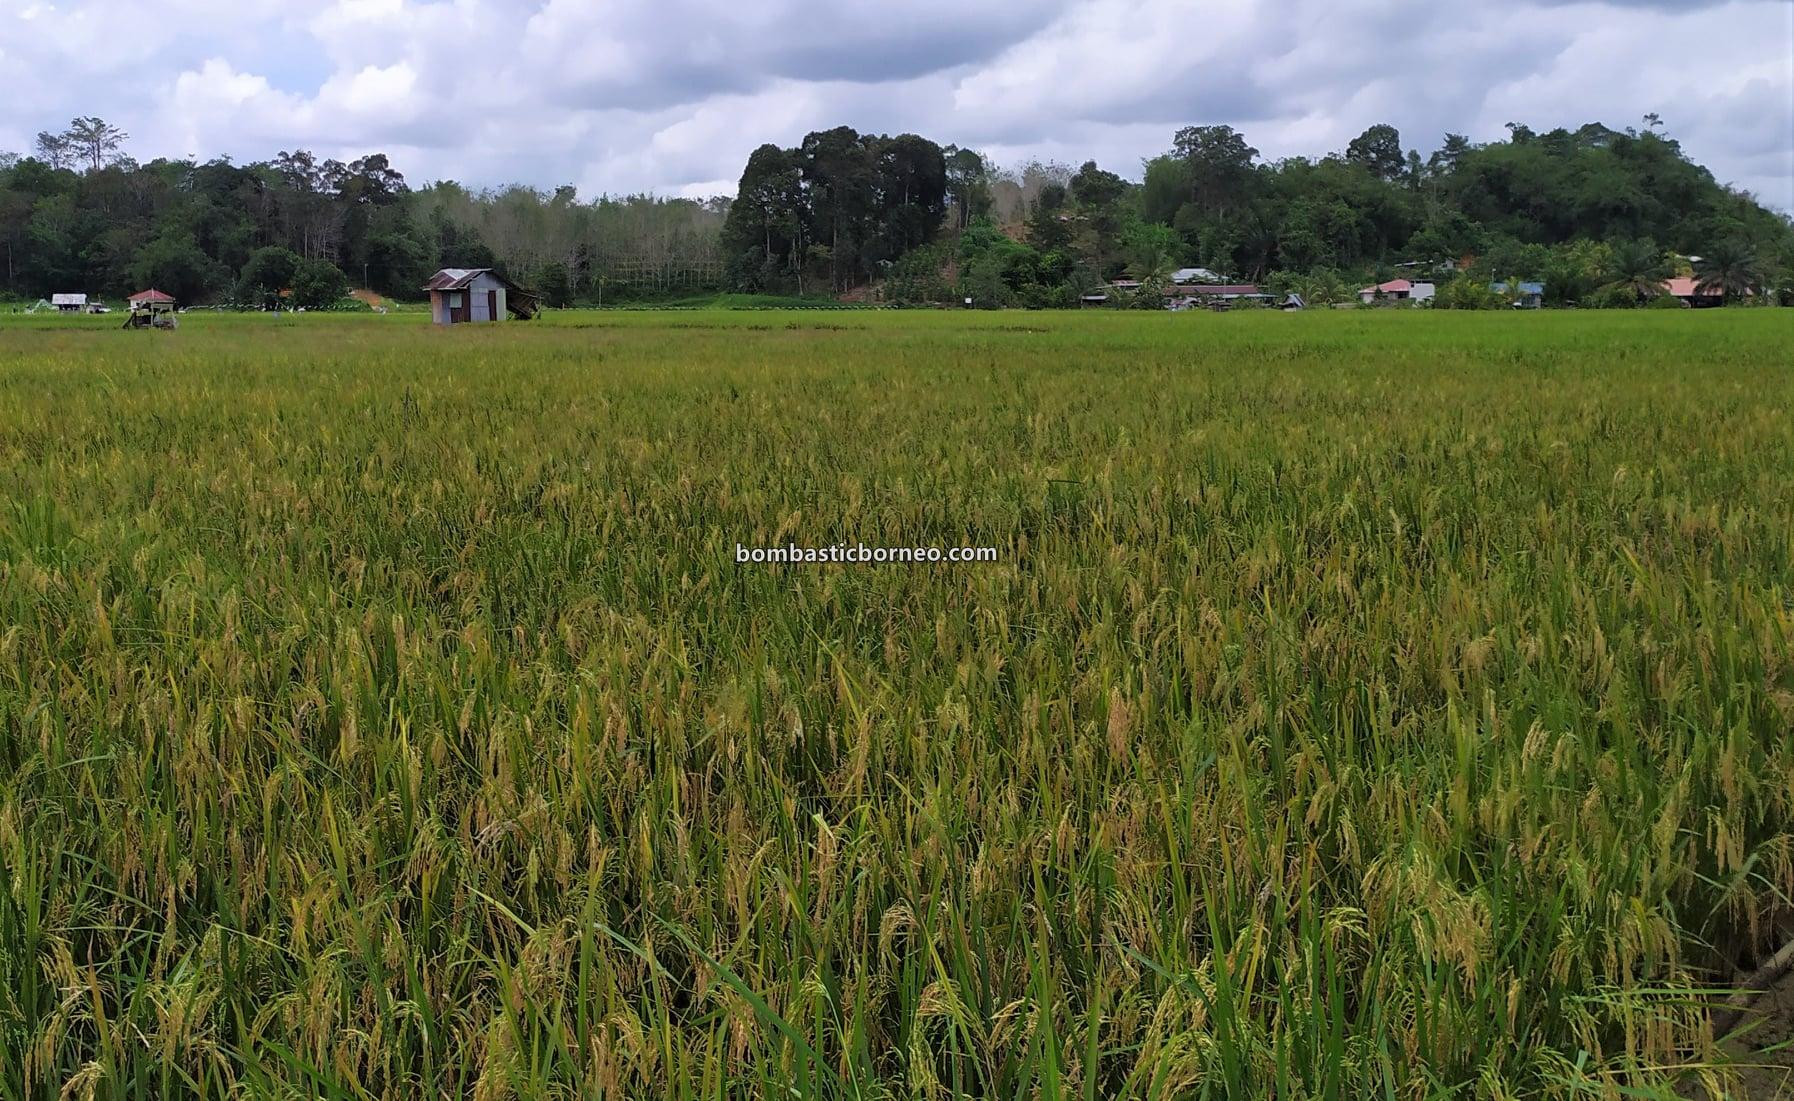 Sawah Padi, Kampung Skuduk, Village, Dayak Bidayuh, Serian, authentic, backpackers, destination, exploration, objek wisata, ecotourism, Trans Borneo, 马来西亚砂拉越, 探索西连稻米之乡, 婆罗洲稻田景点